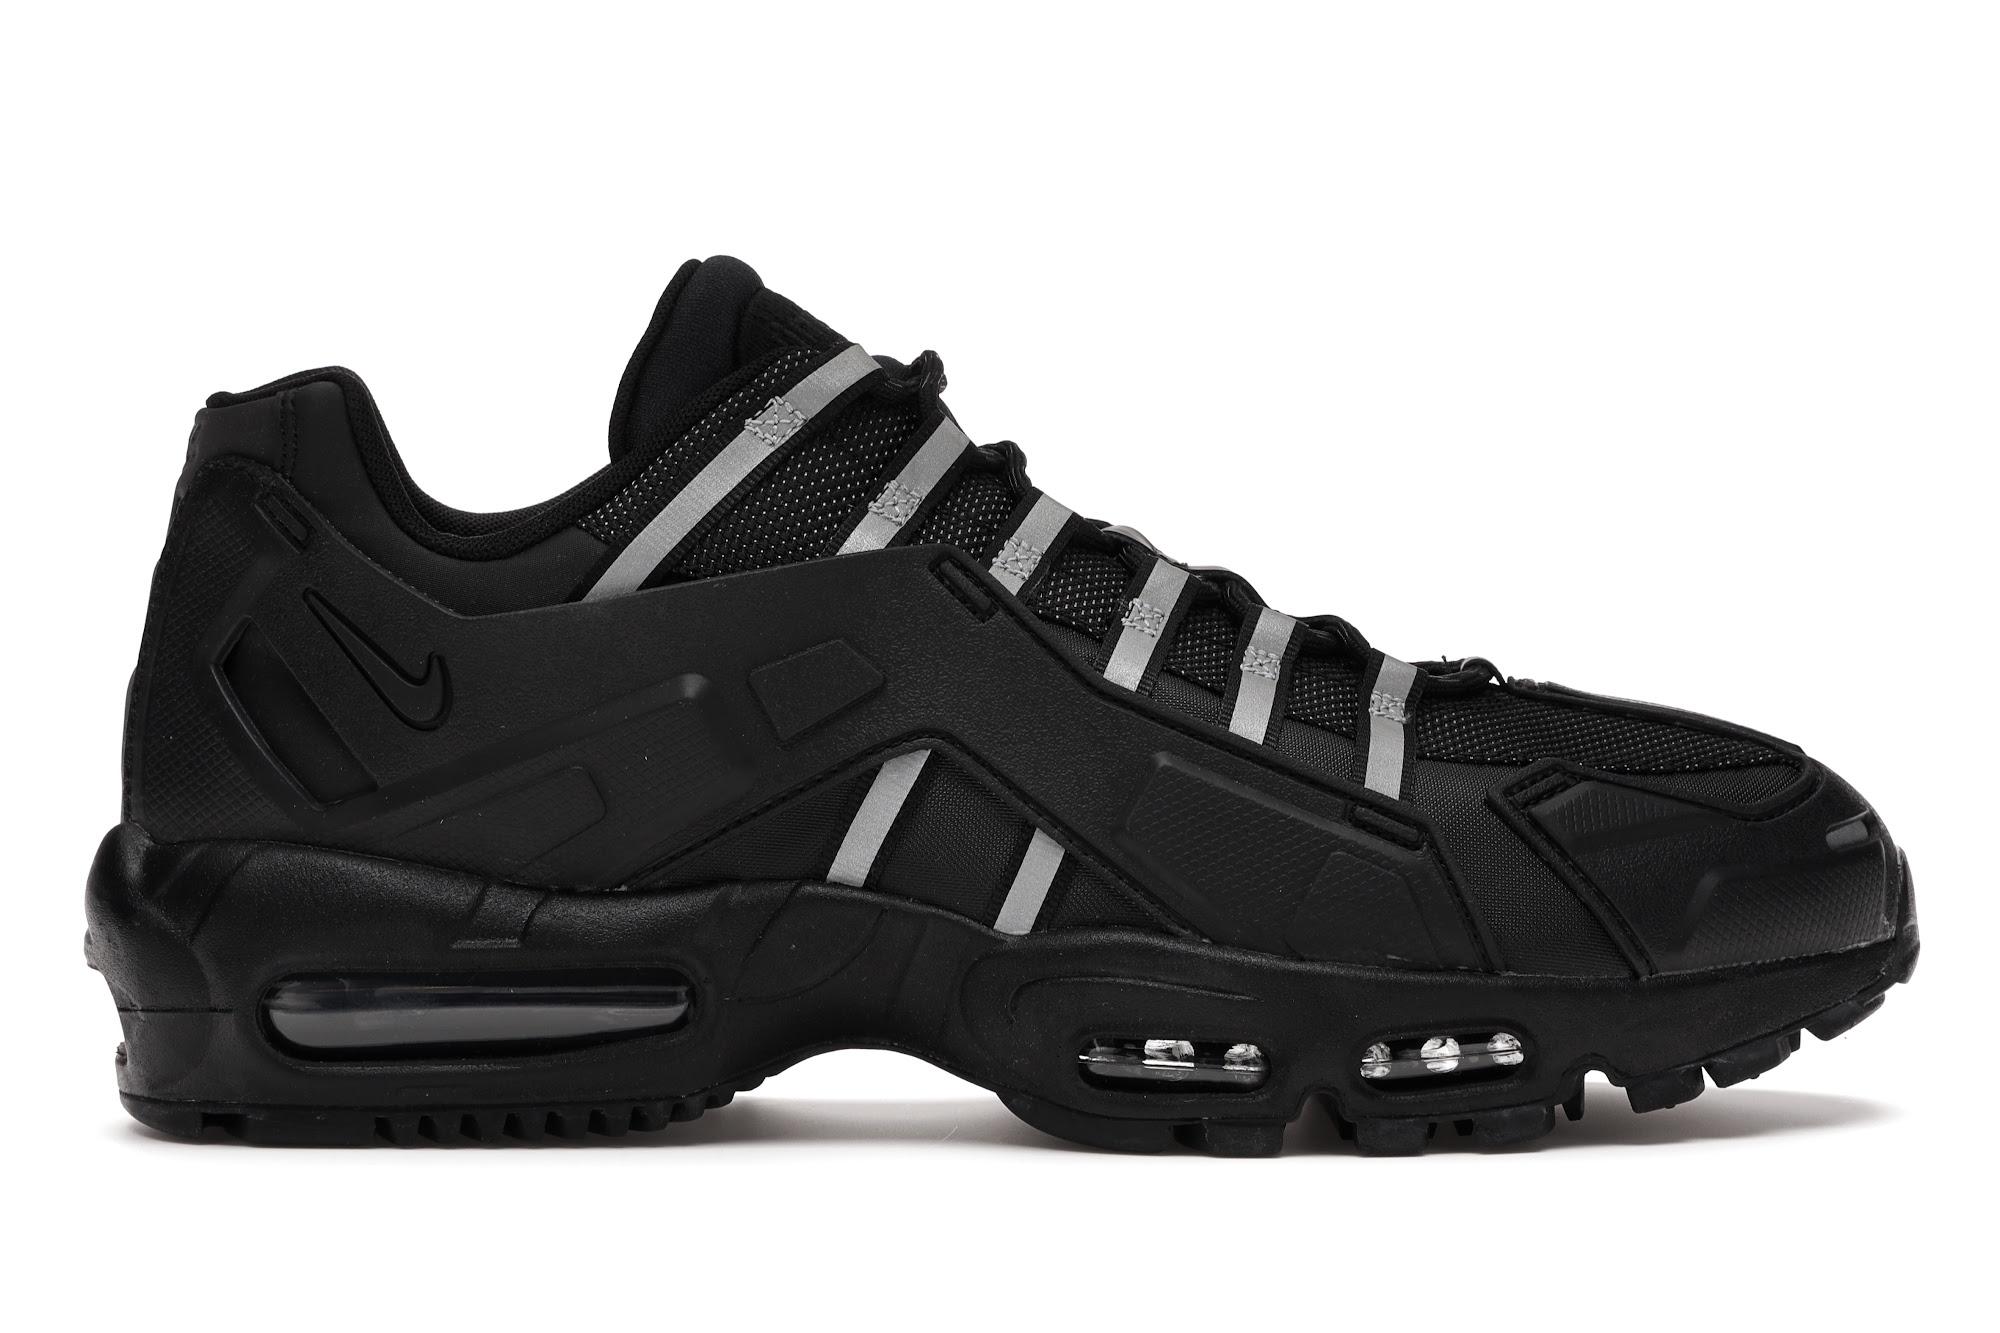 Nike Air Max 95 NDSTRKT Black Reflective